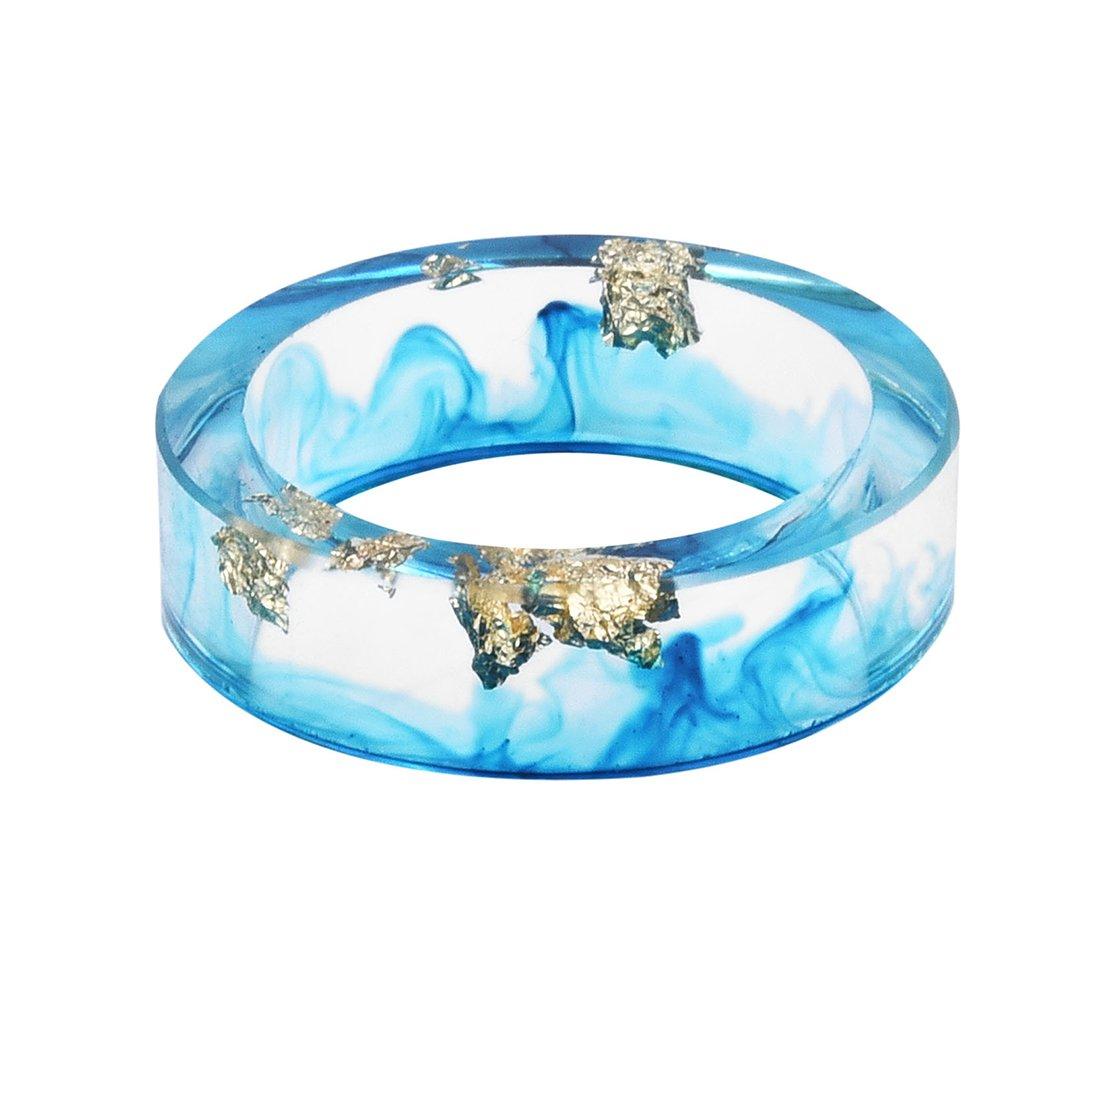 DALARAN Resin Ring with Gold Foil Inside Handmade Colorful Ink Transparent Women Charm Rings DWJLR2493-99